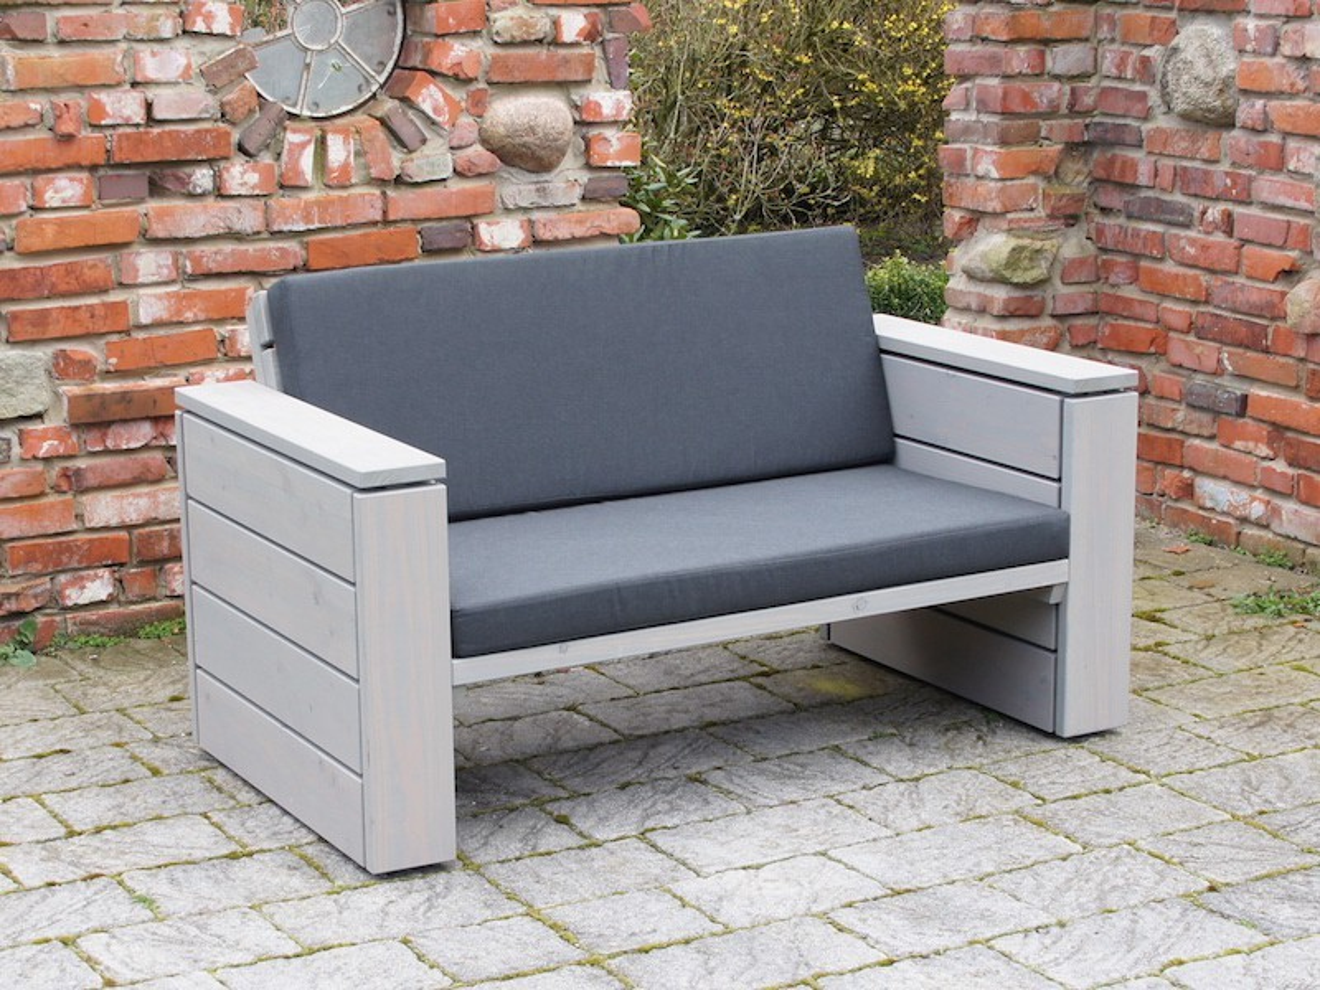 lounge sofa 2 sitzer zeitlose loungem bel aus heimischem holz. Black Bedroom Furniture Sets. Home Design Ideas